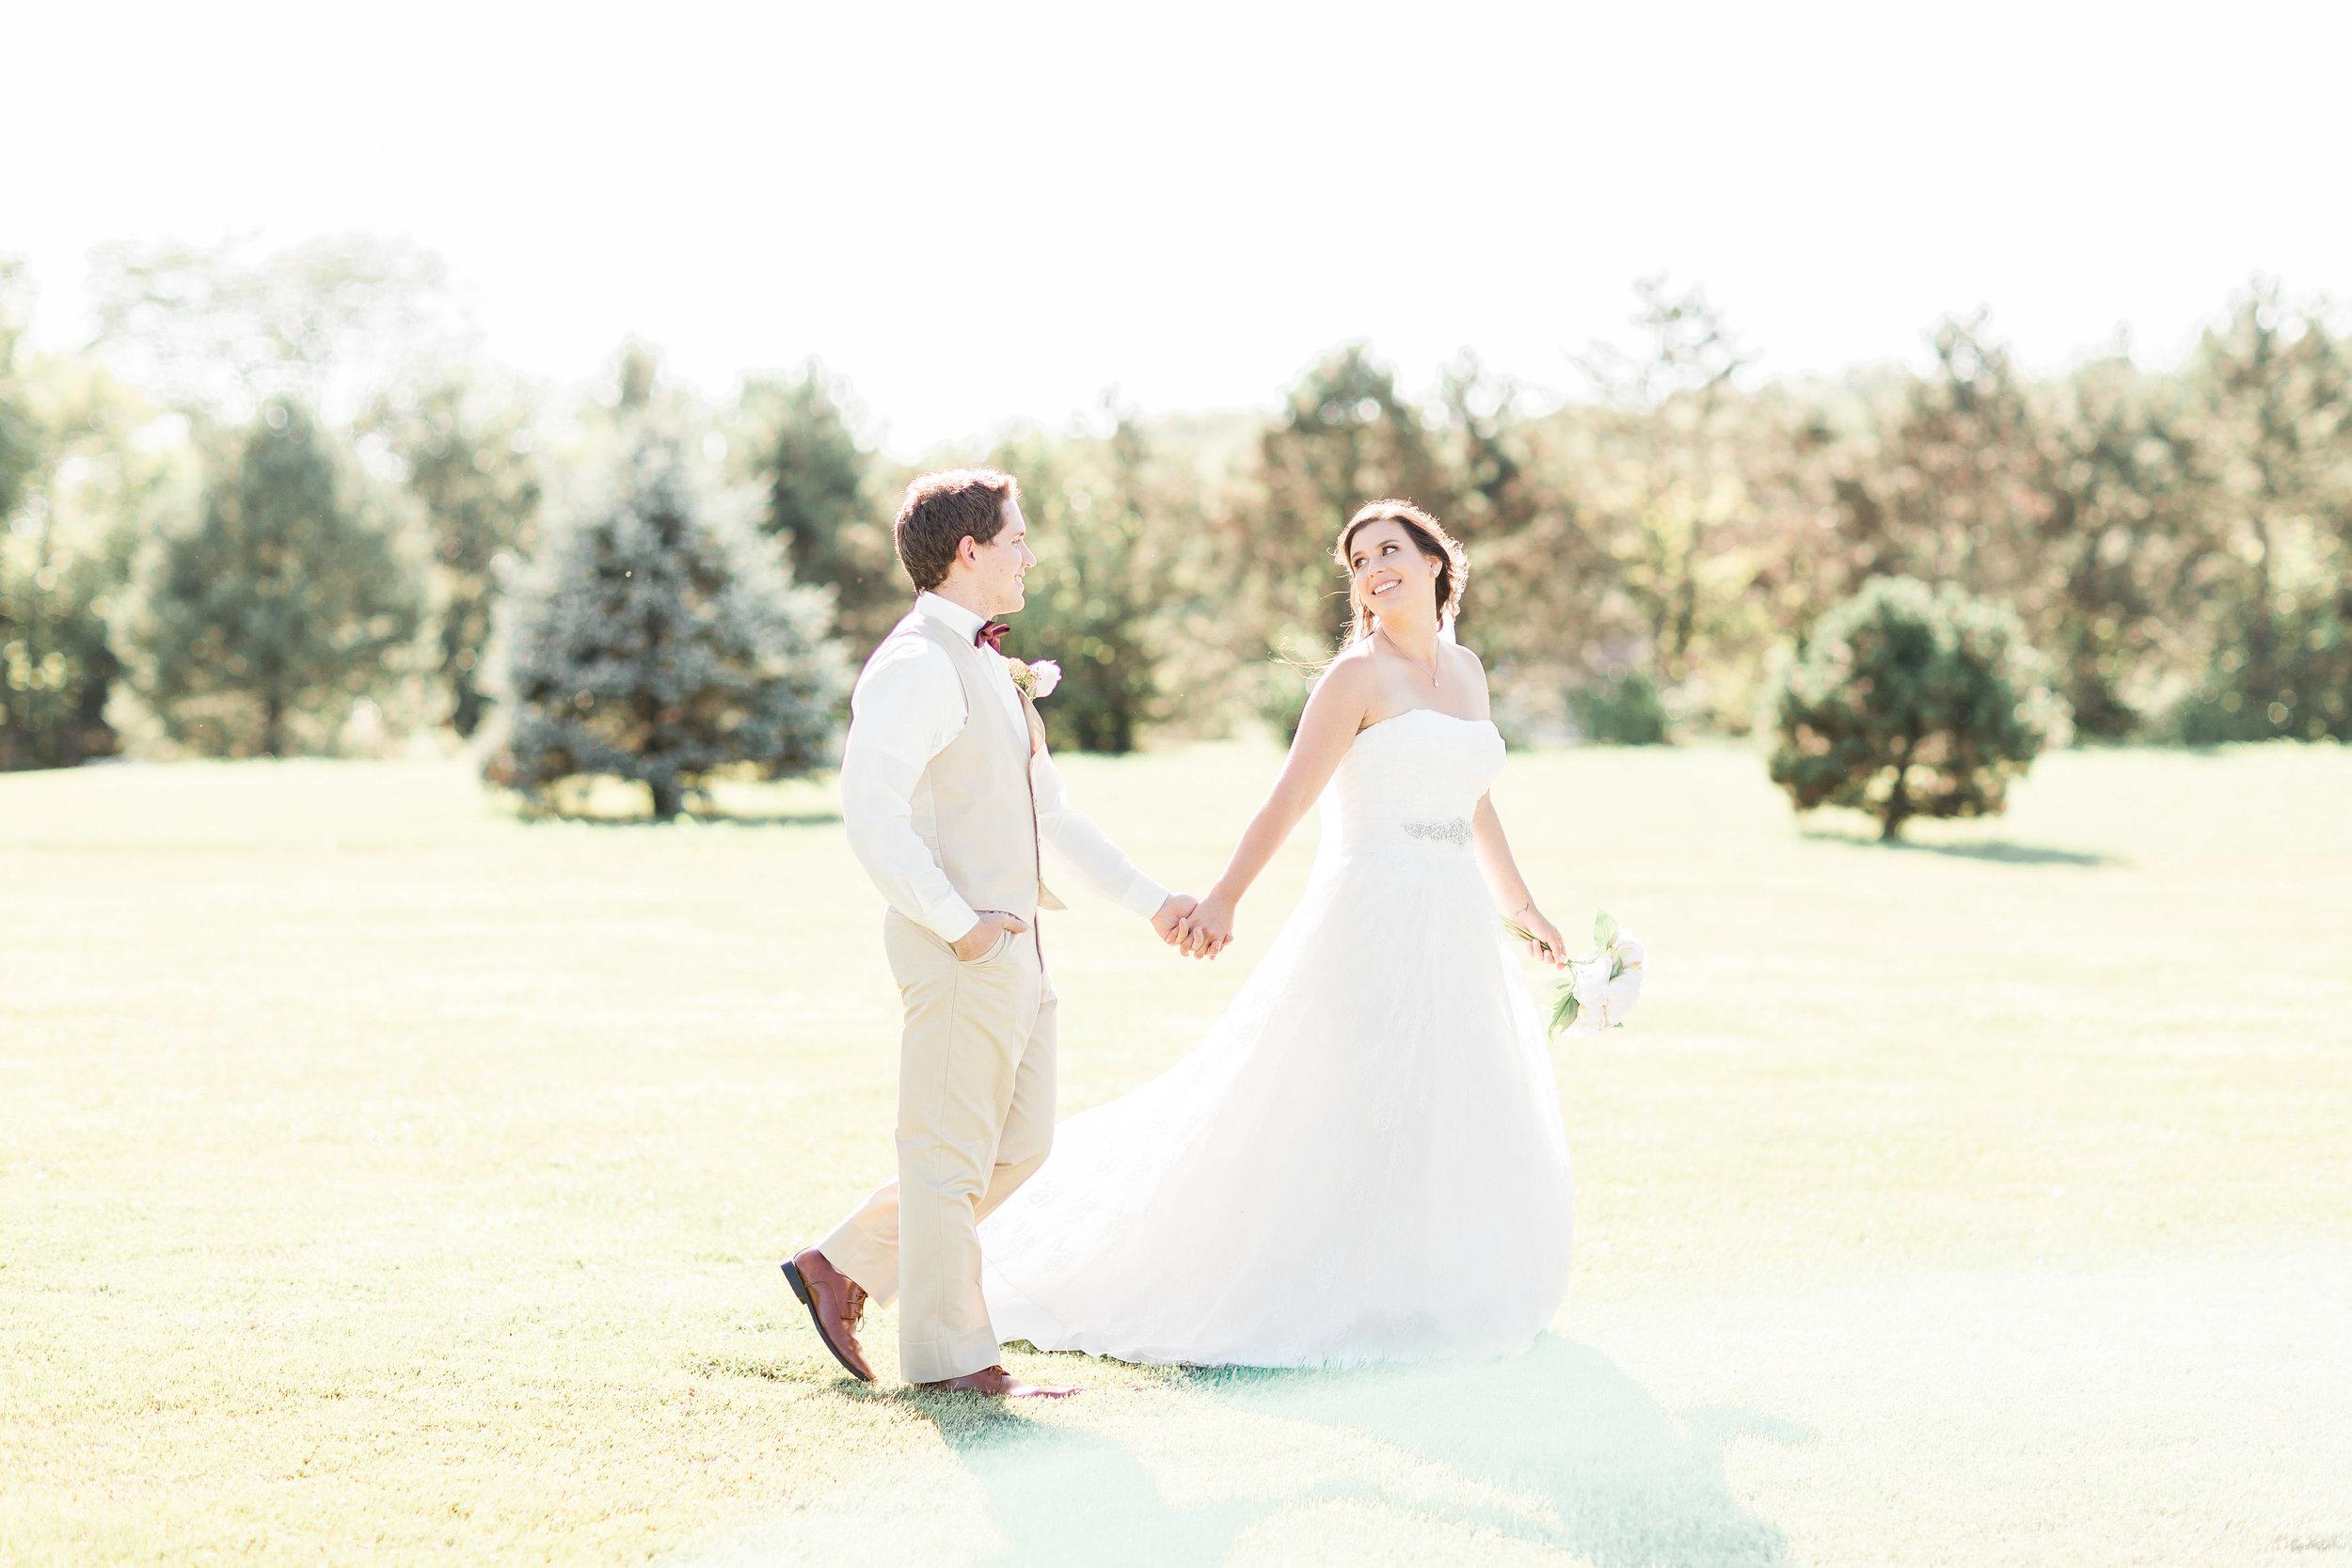 wedding photographers cincinnati ohio dayton ohio-3.jpg